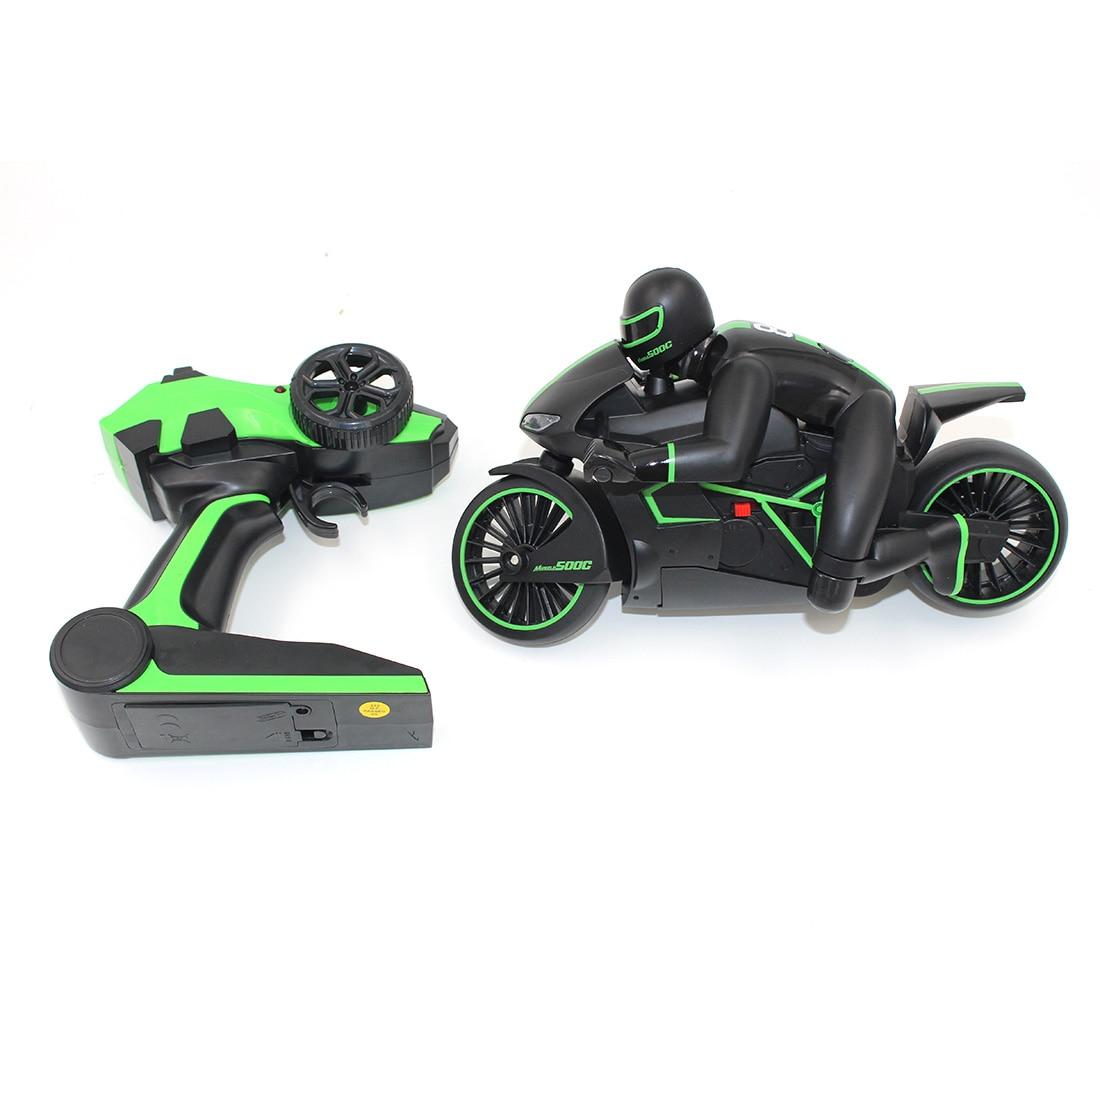 RC Children Toys Car High-speed Motorcycle - Green (Euro Plug)